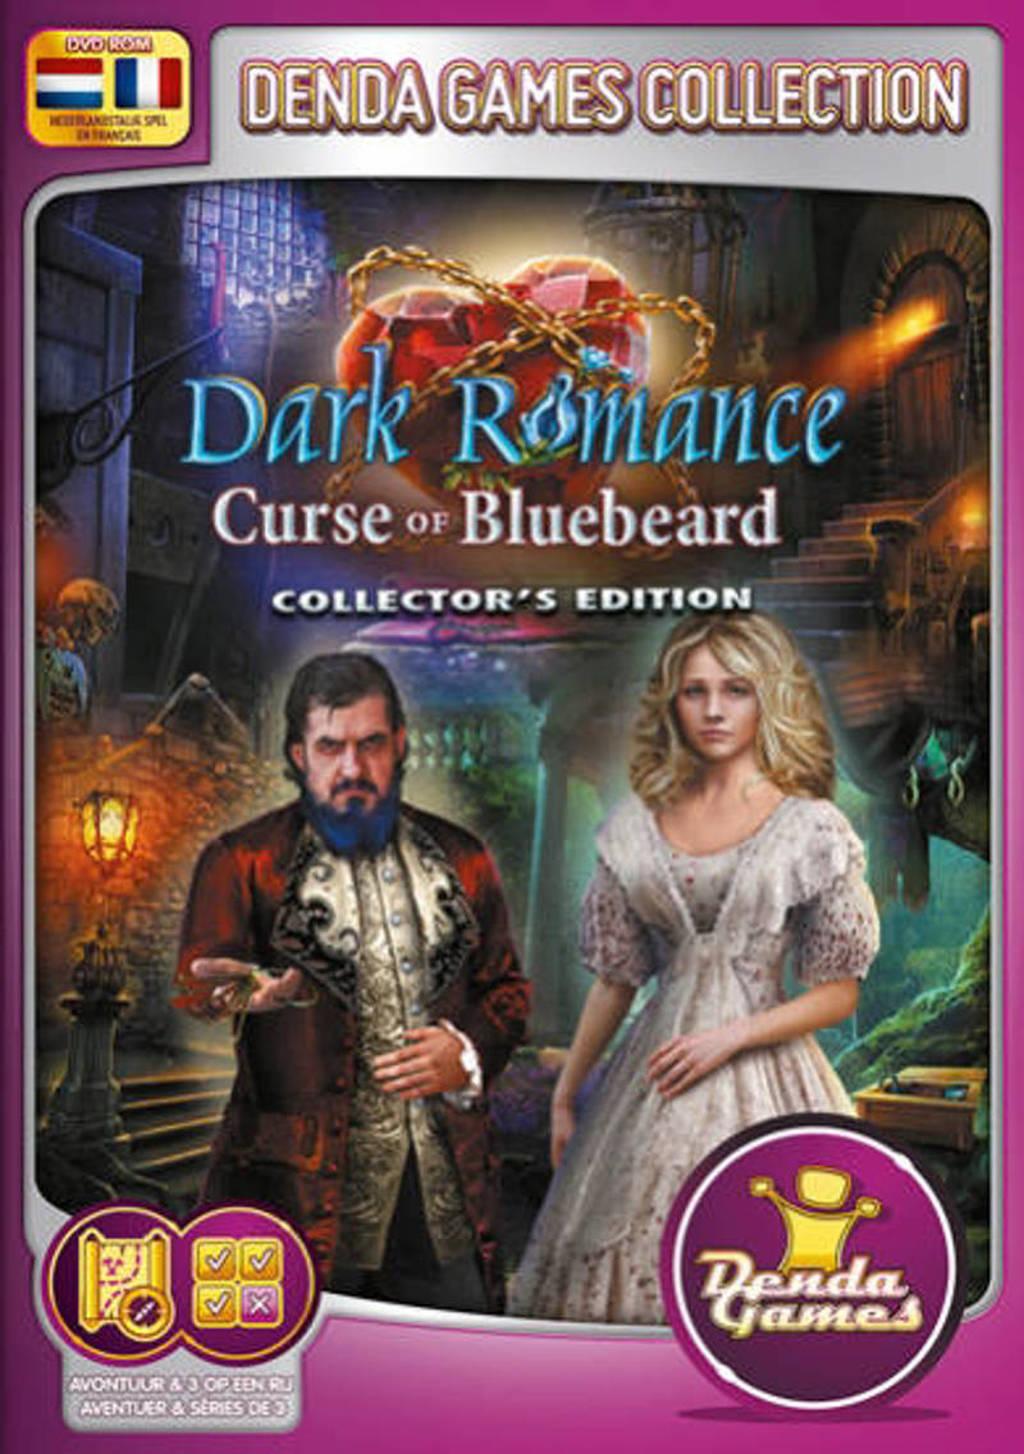 Dark romance - Curse of bluebeard (Collectors edition)  (PC)